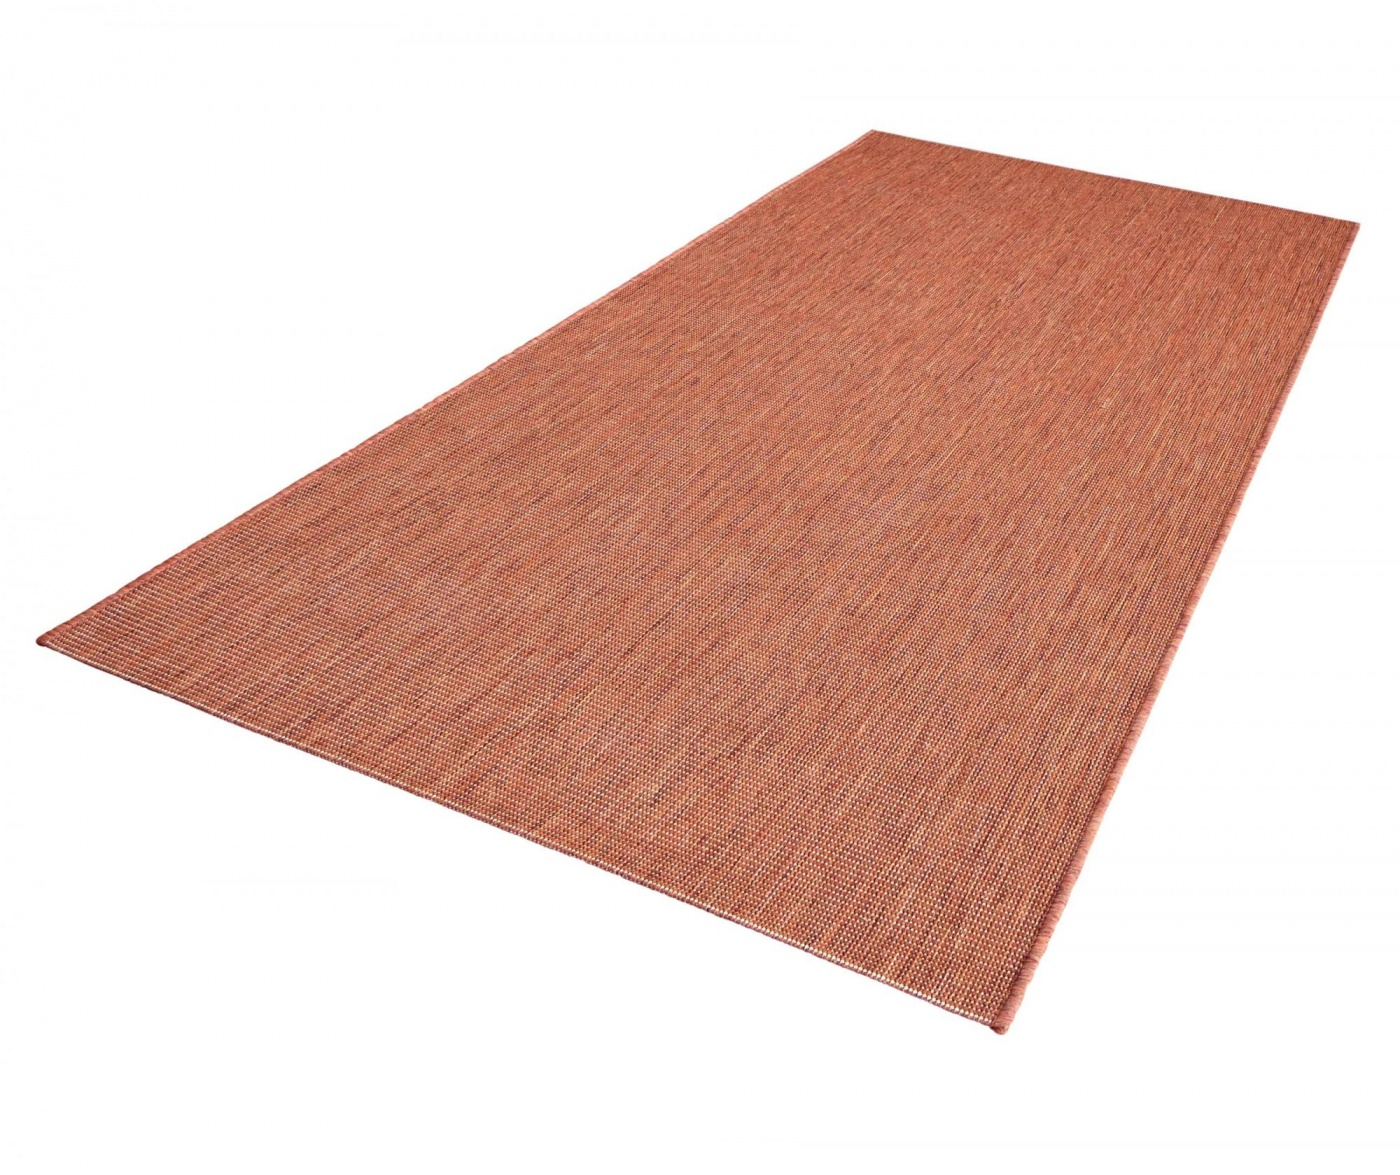 Covor de exterior Meadow Match Terracotta 80x200 cm